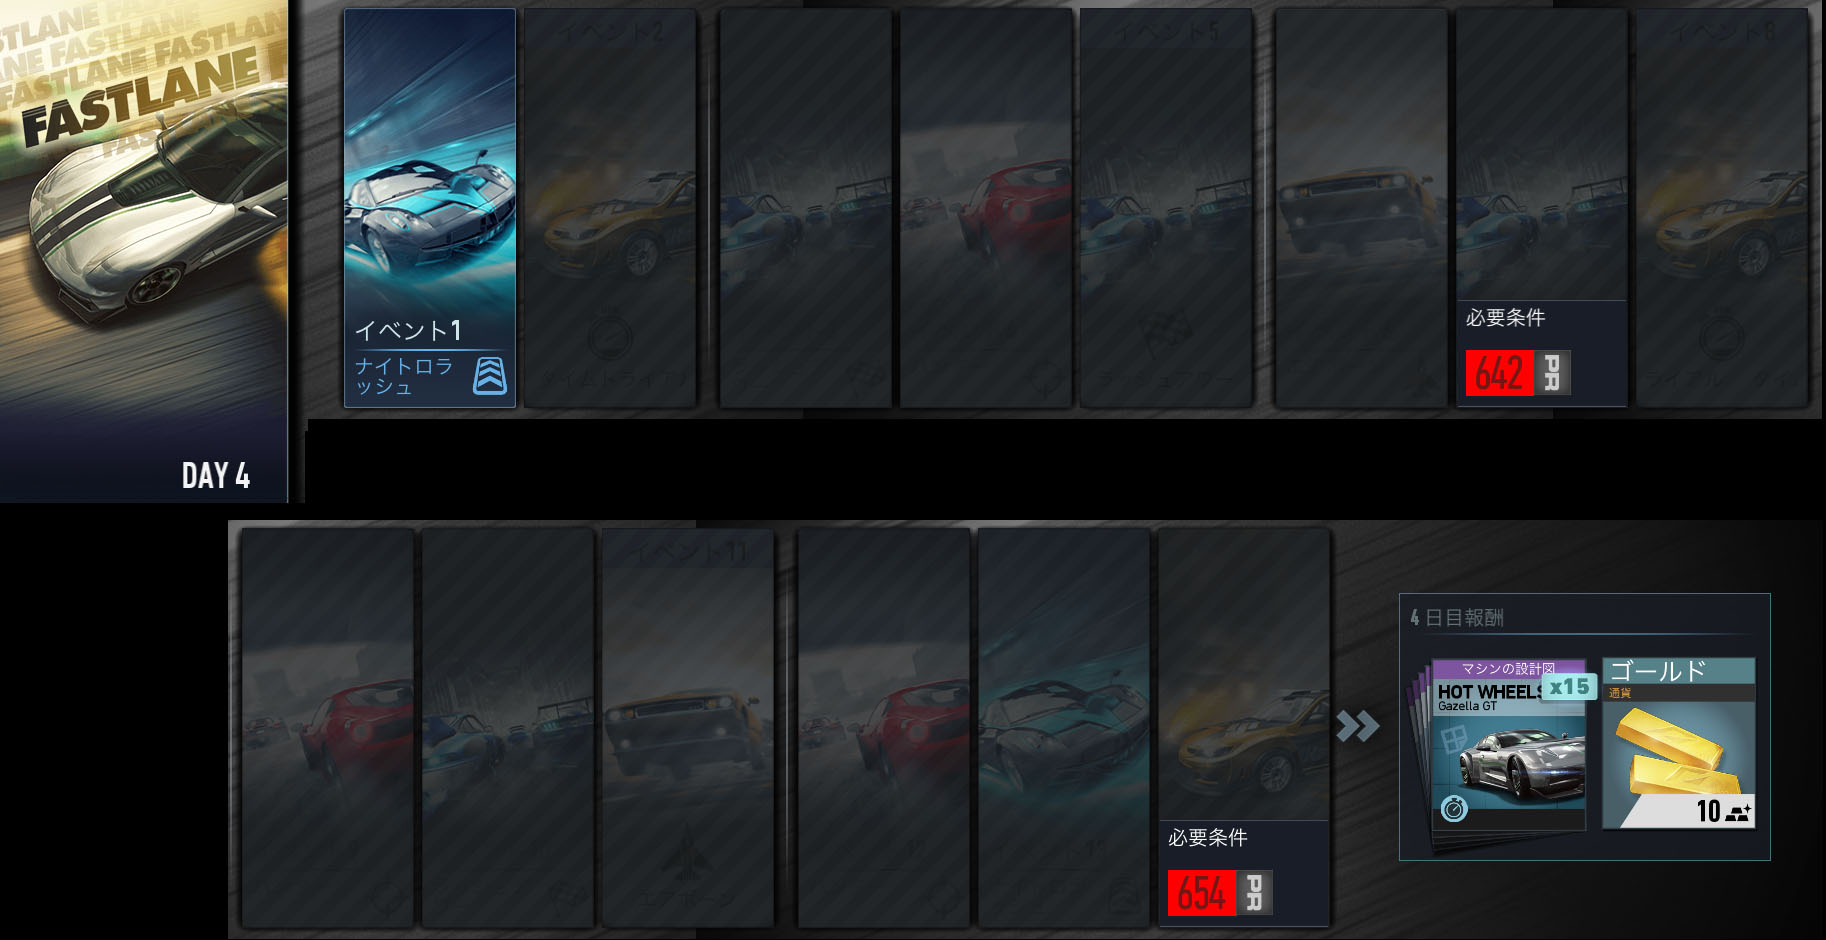 (DAY4更新) ニードフォースピード ノーリミット 攻略 Hot Wheels Gazella GT をゲットせよ!